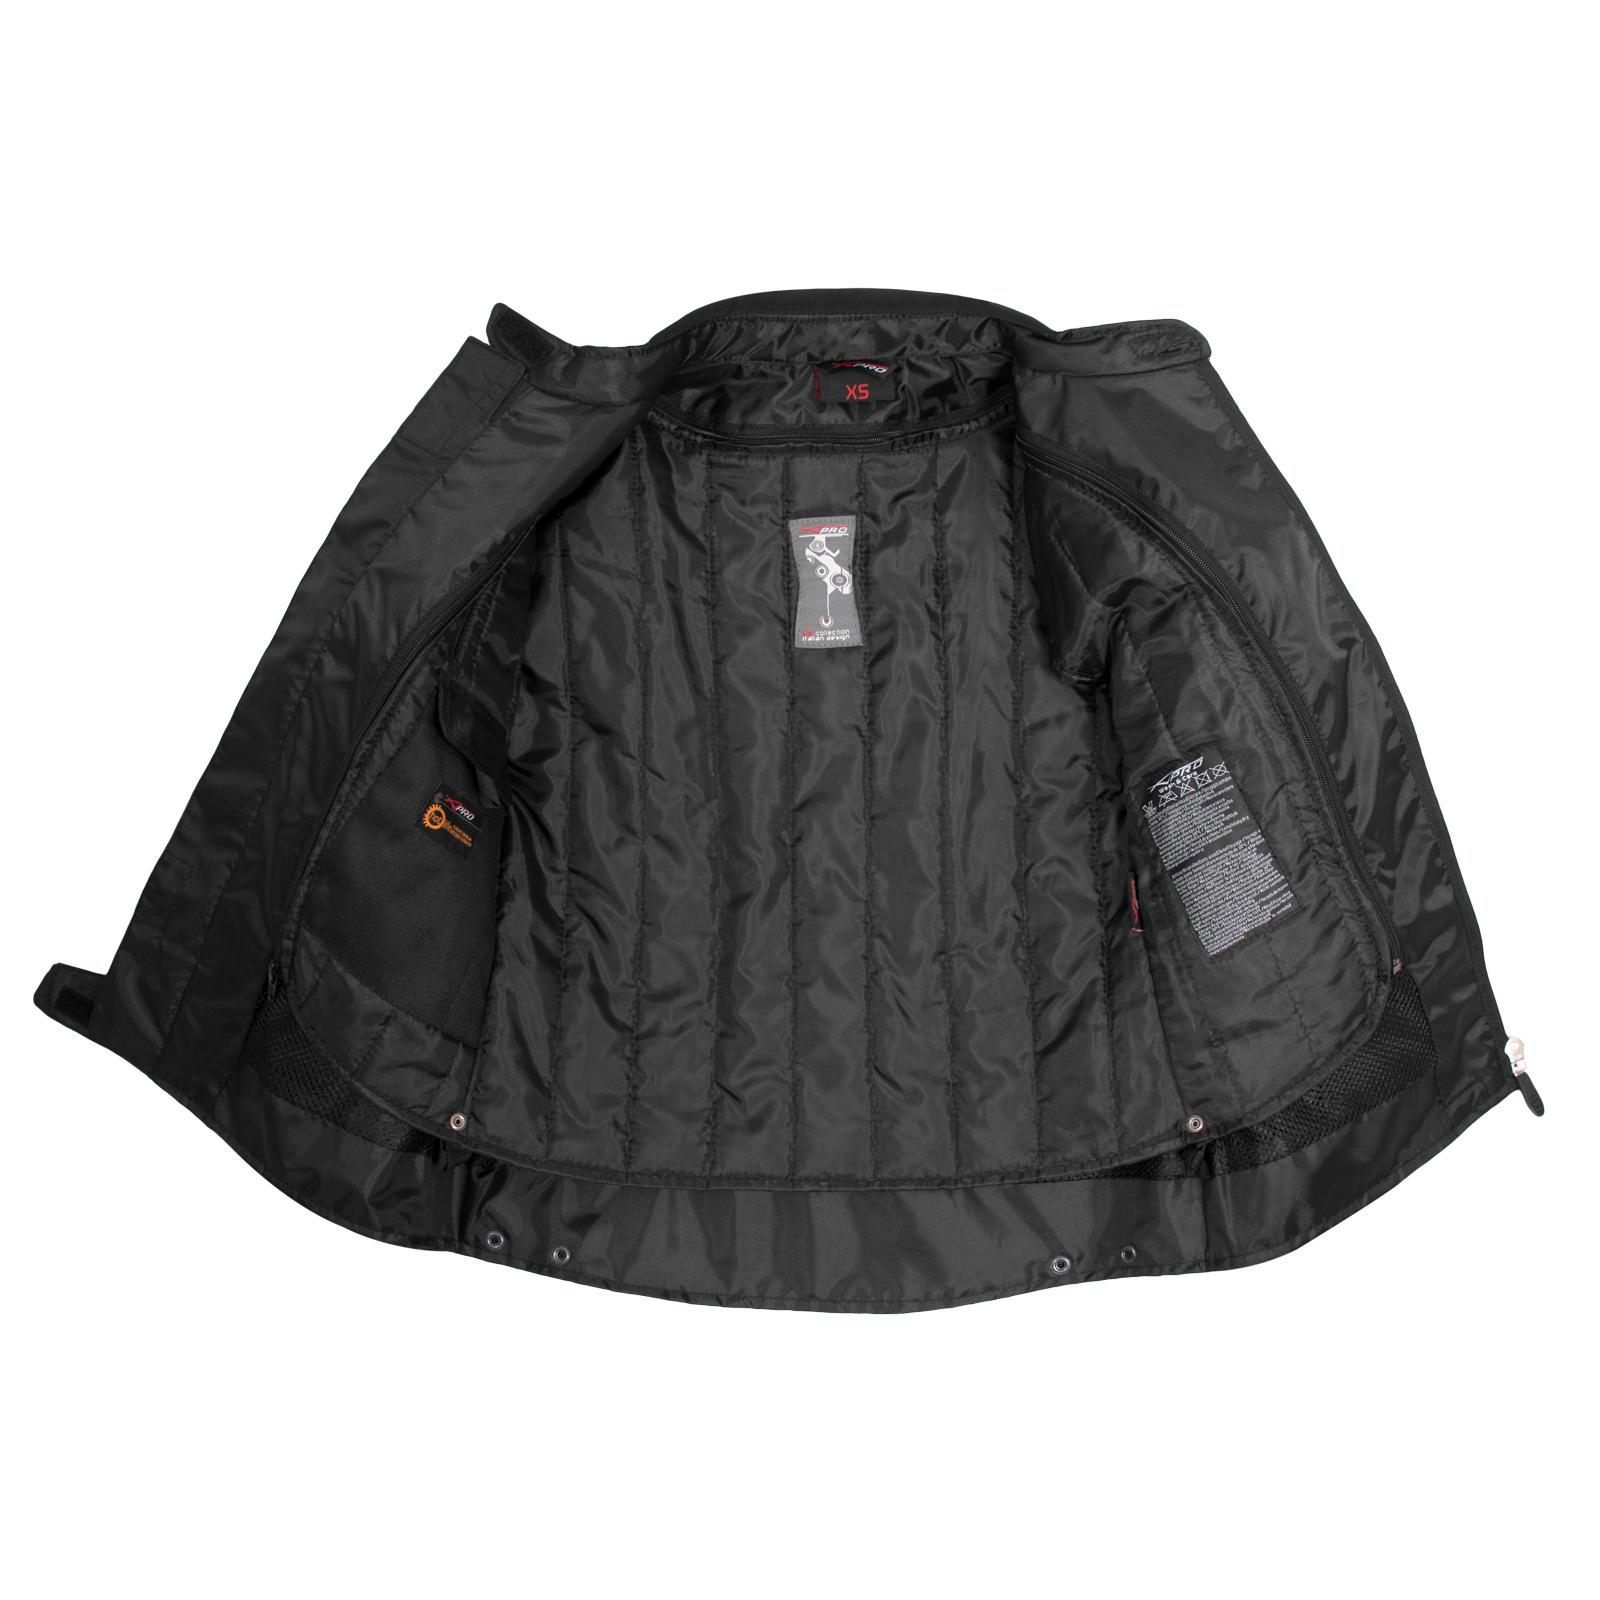 Giacca-Lady-Moto-Donna-Tessuto-Protezioni-CE-Termico-Sfoderabile-Scooter miniatura 10